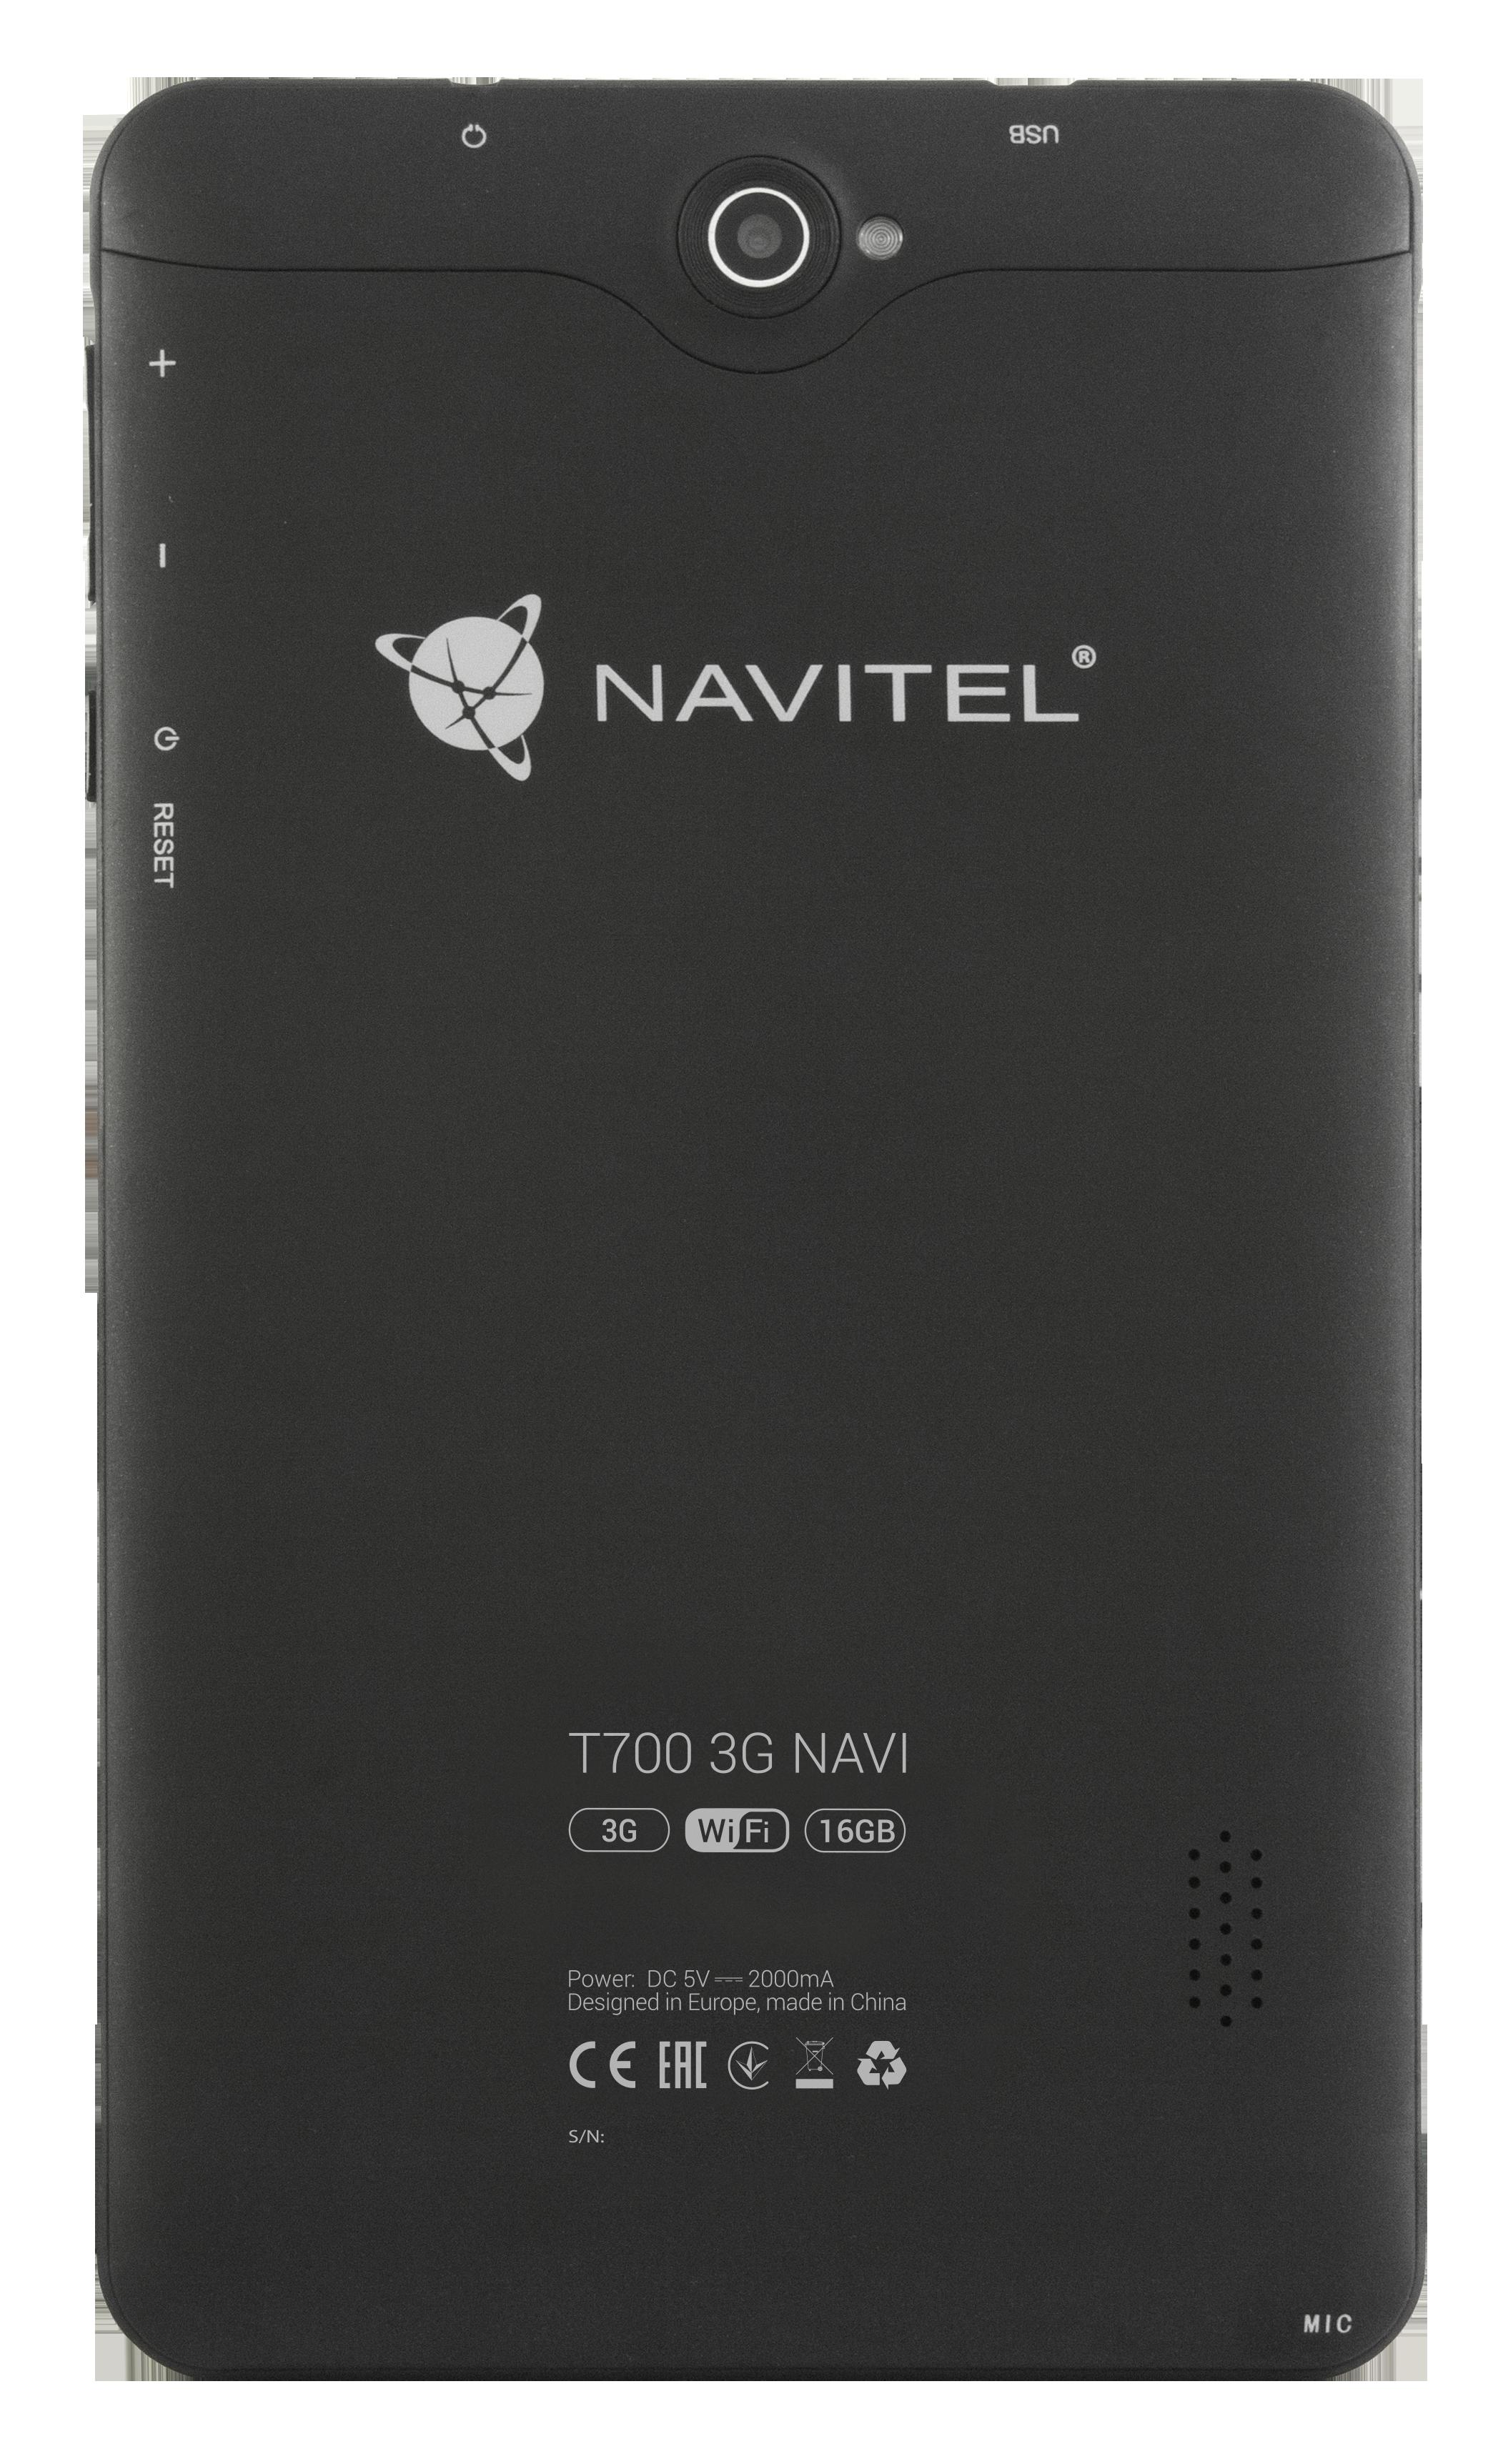 NAVT7003GP Navigationssystem NAVITEL NAVT7003GP - Große Auswahl - stark reduziert